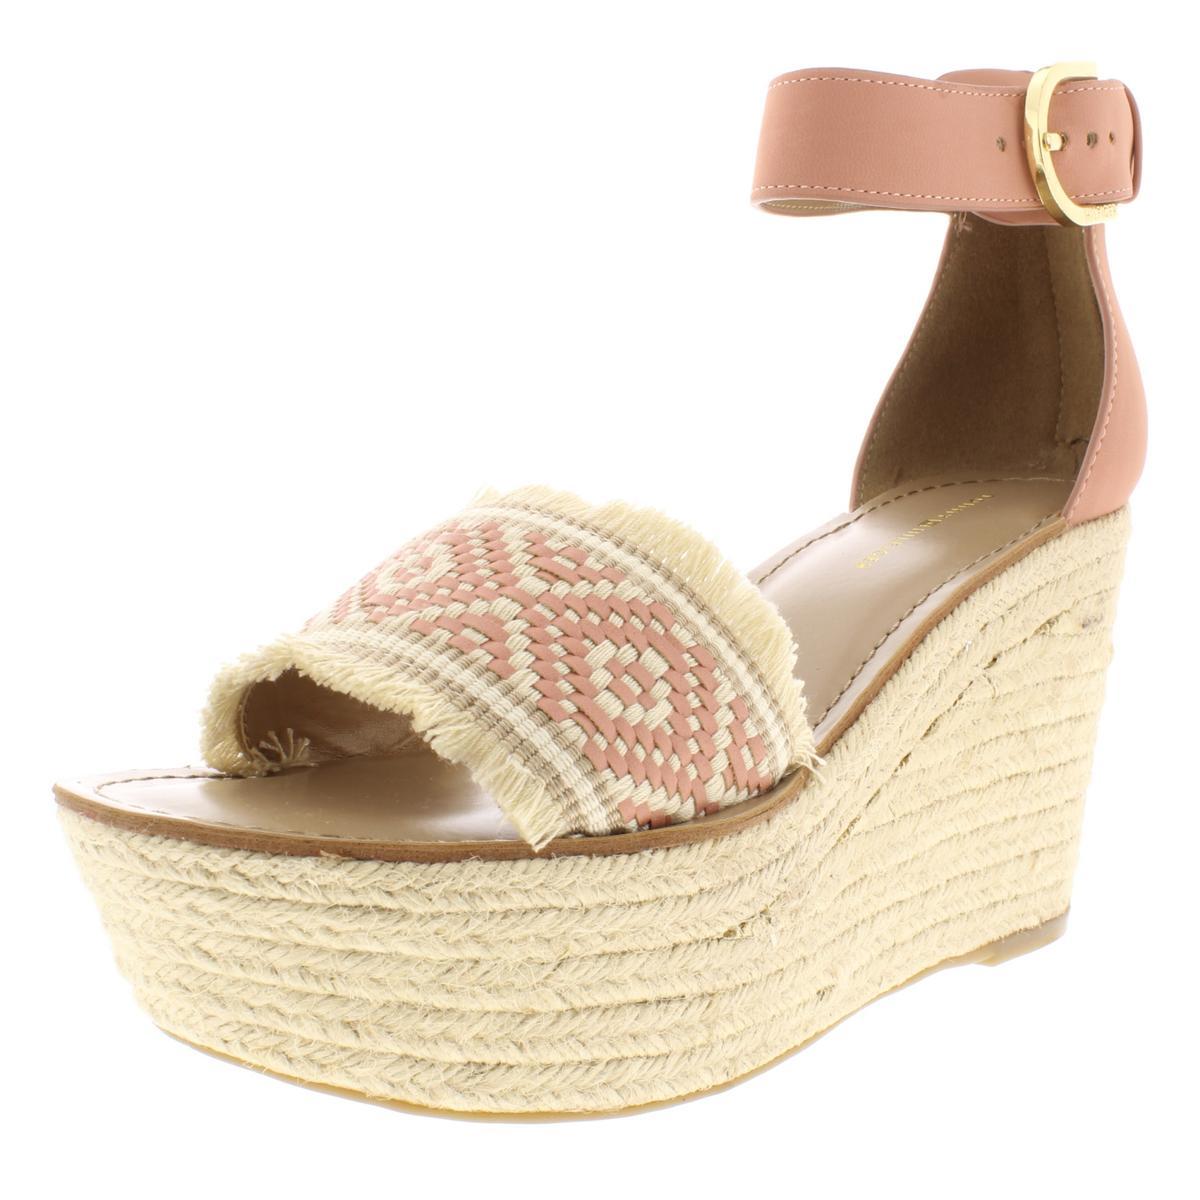 46ffc856eb Details about Tommy Hilfiger Womens Terrin Sandals Platform Espadrilles  Wedges BHFO 7489